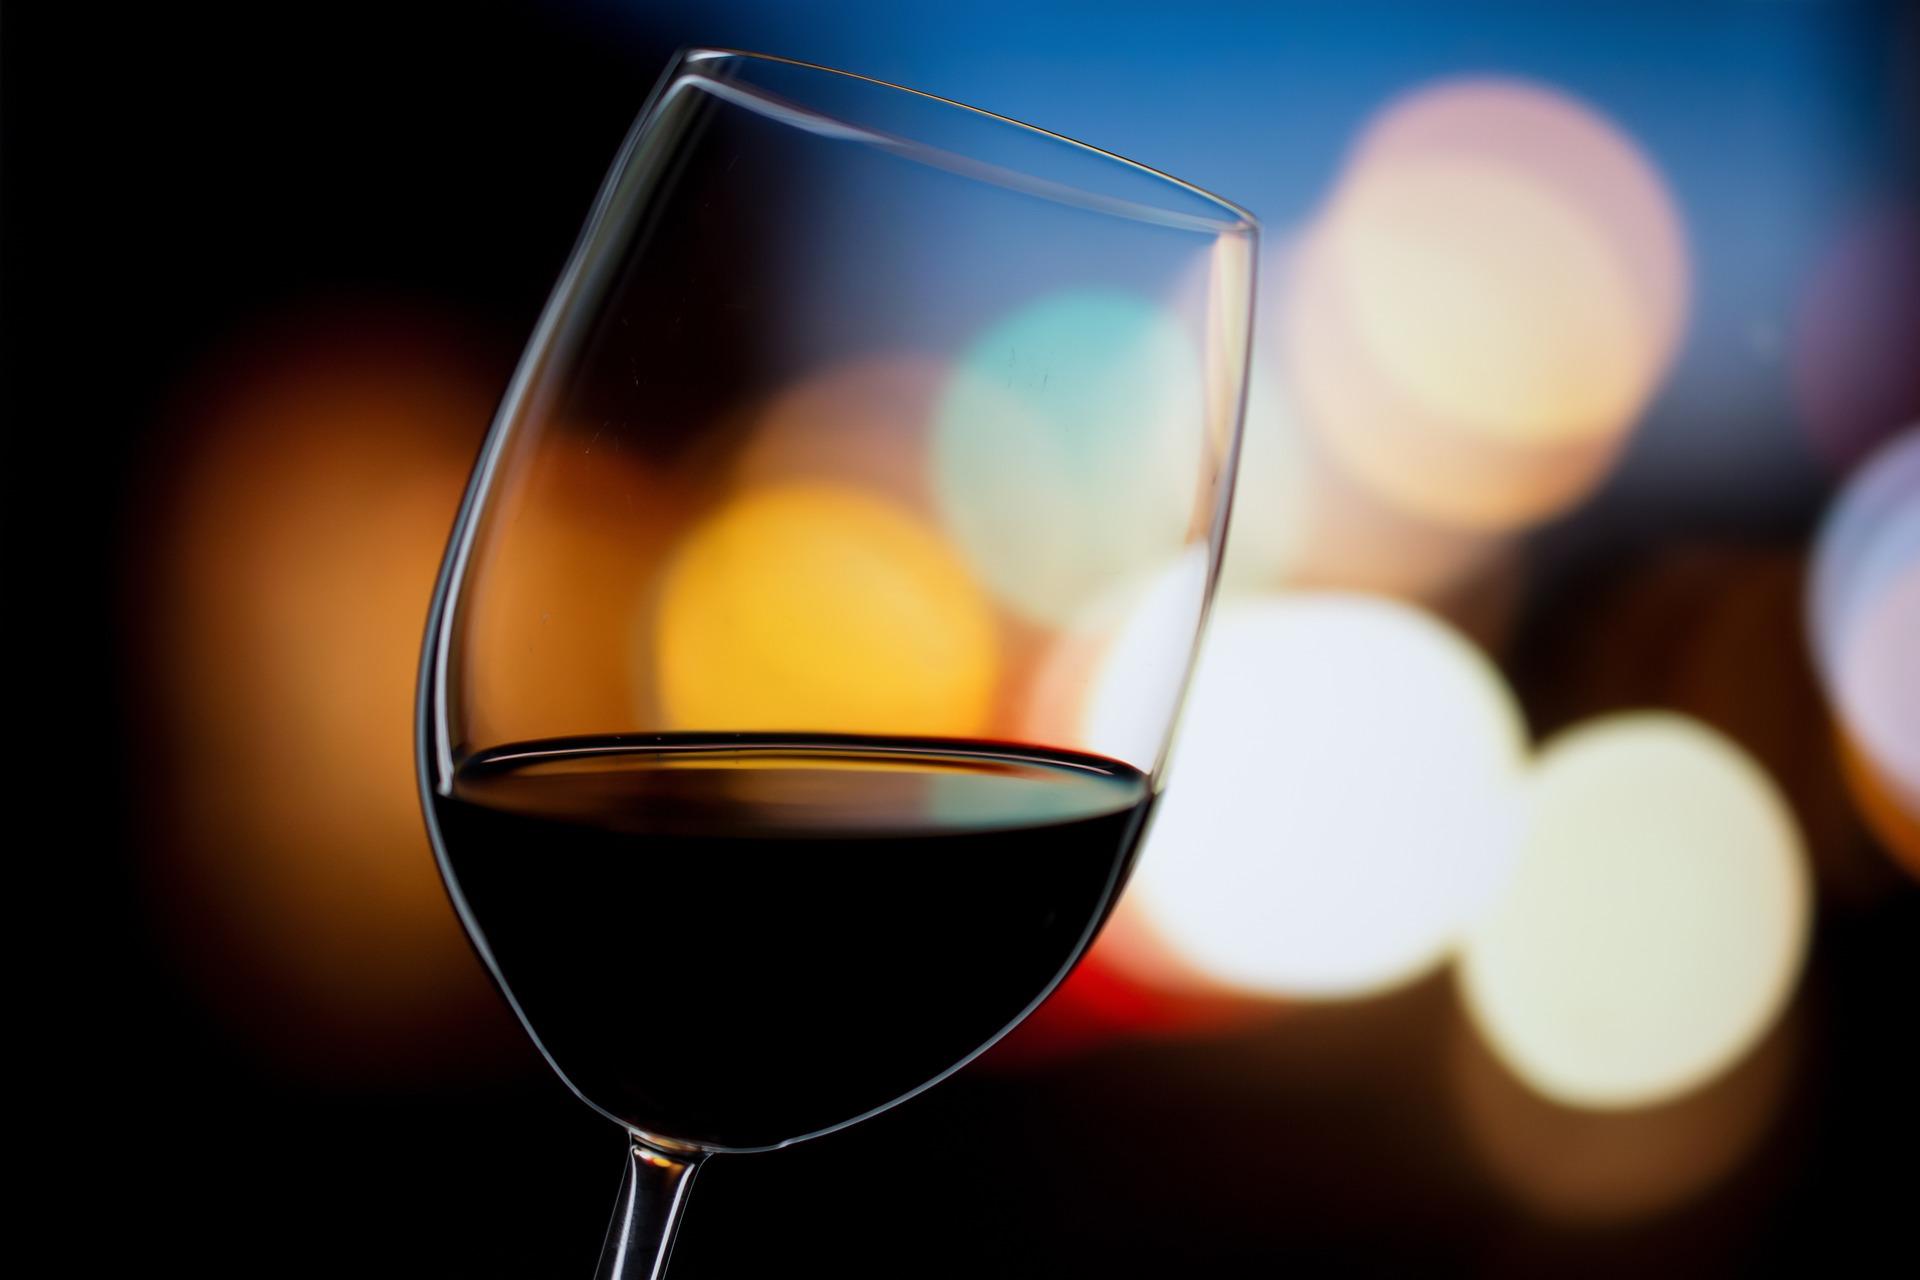 wine-3446767_1920.jpg